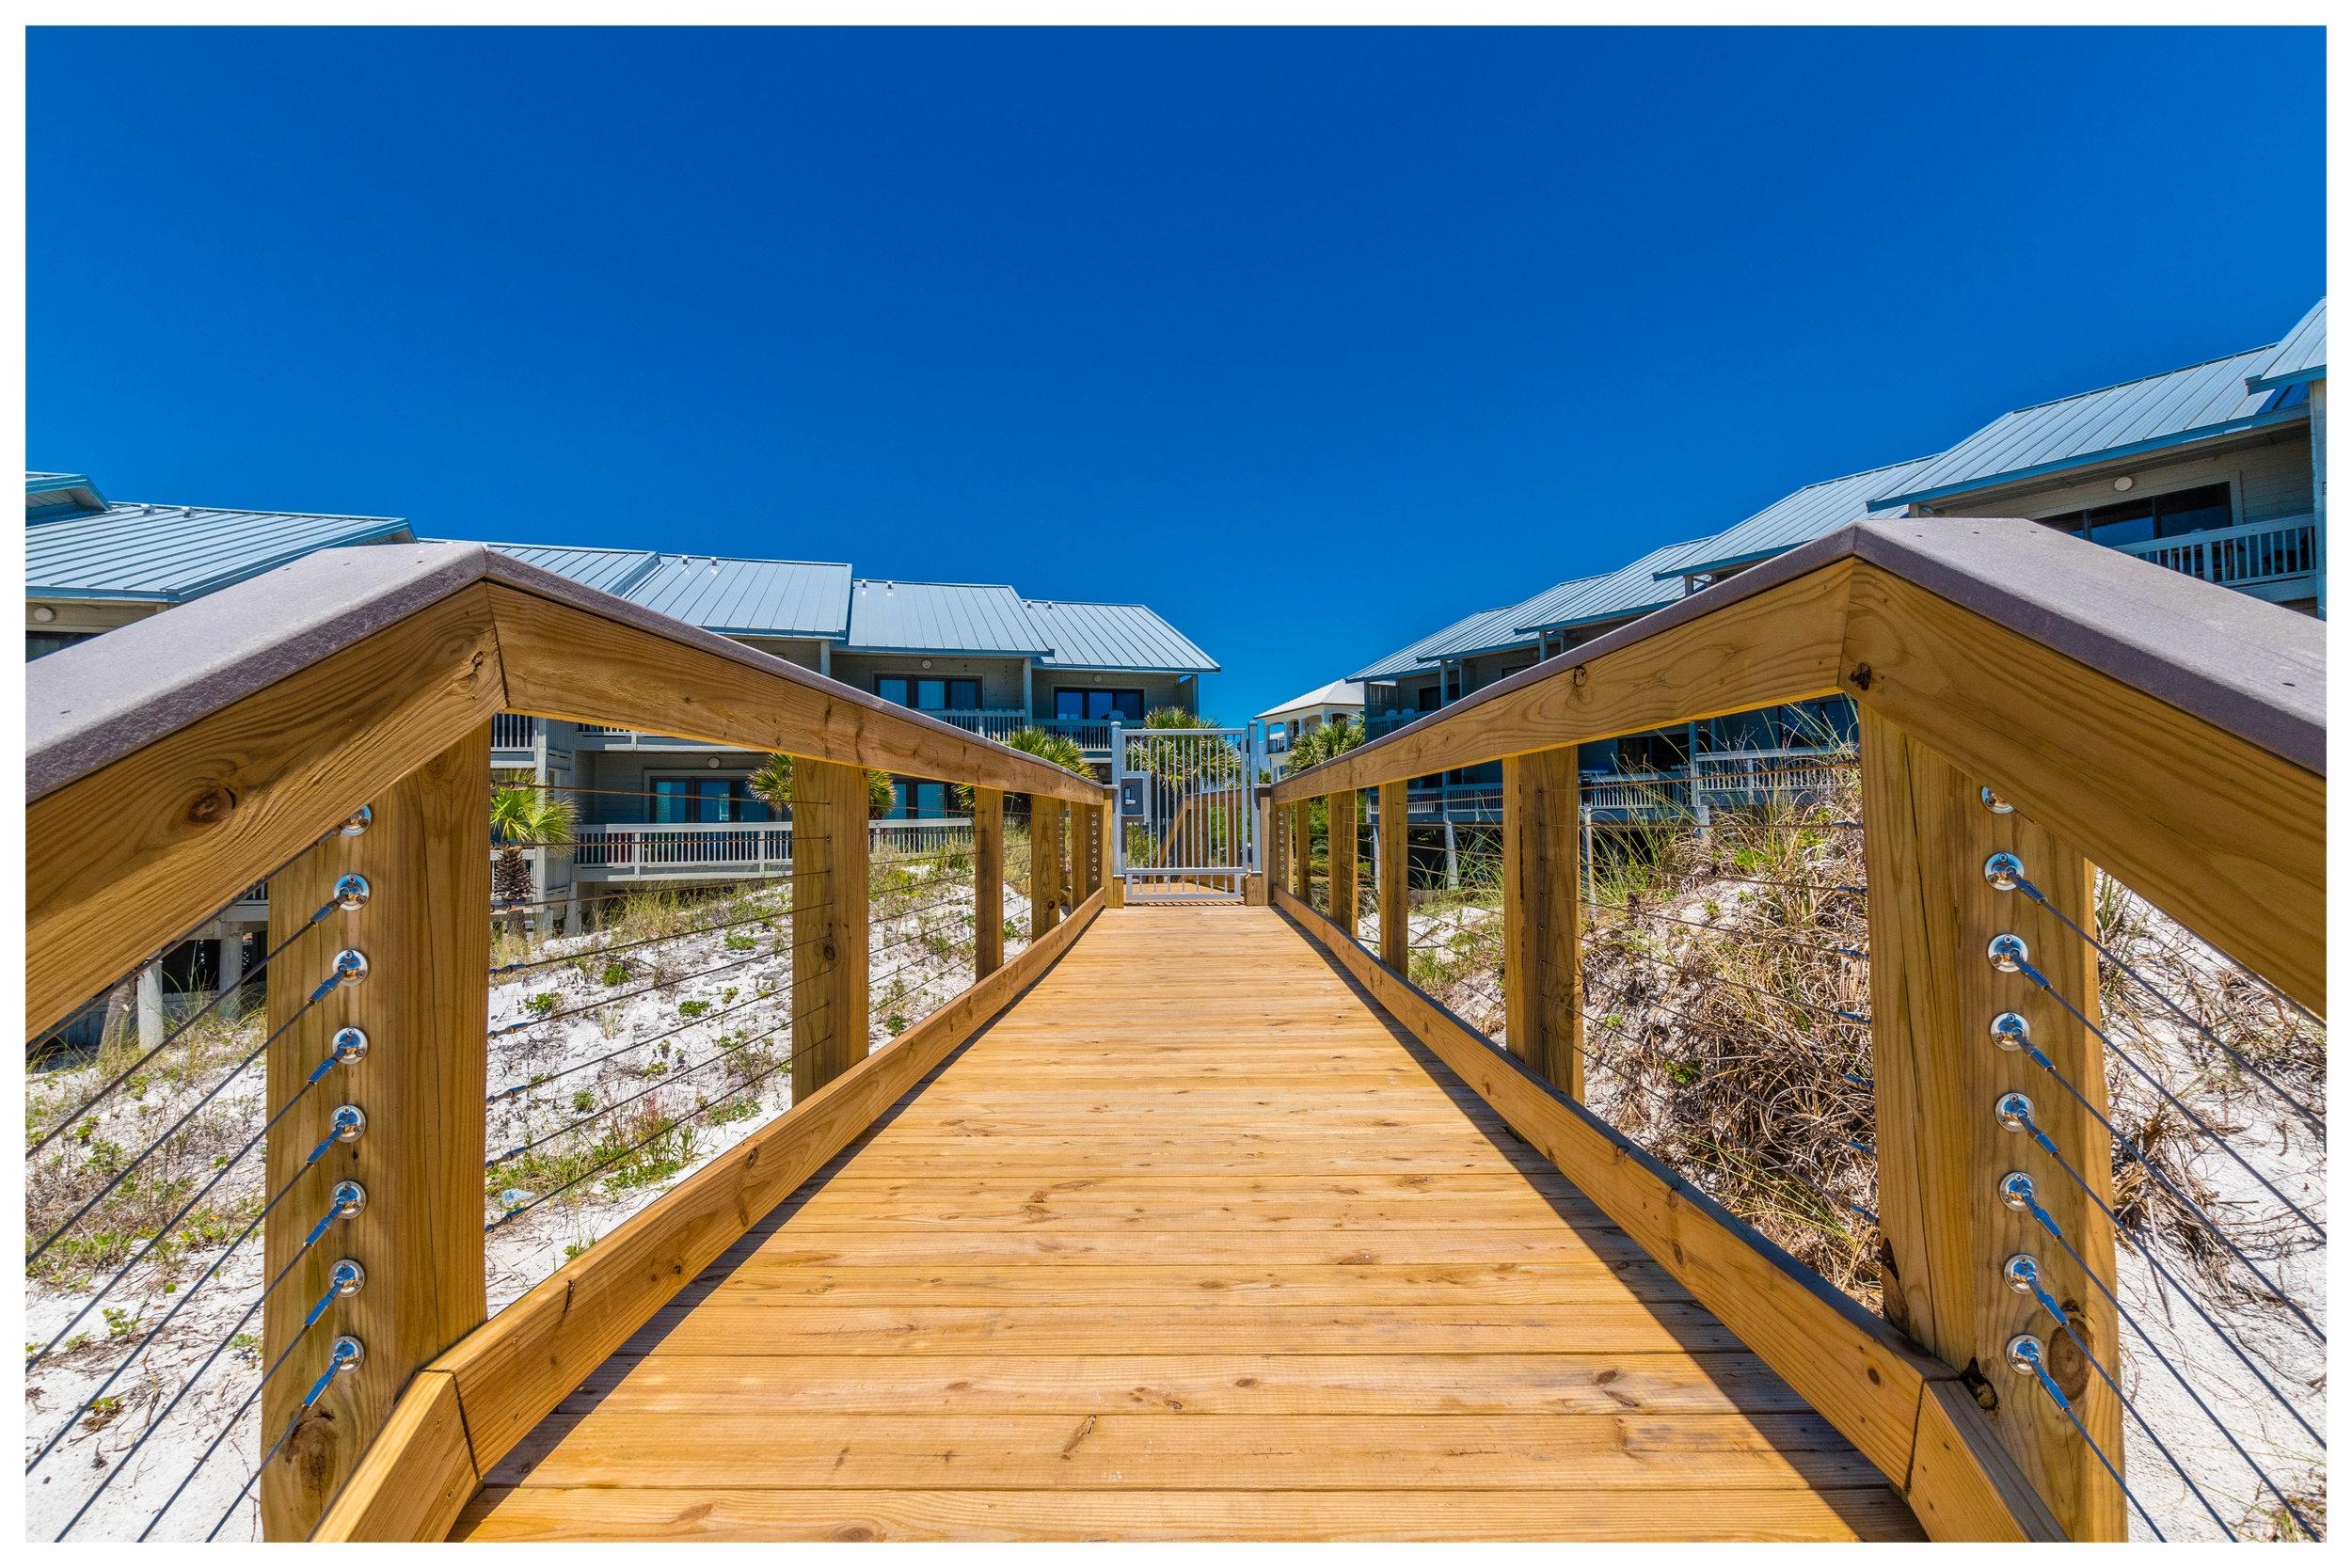 Wooden Boardwalk Construction Company